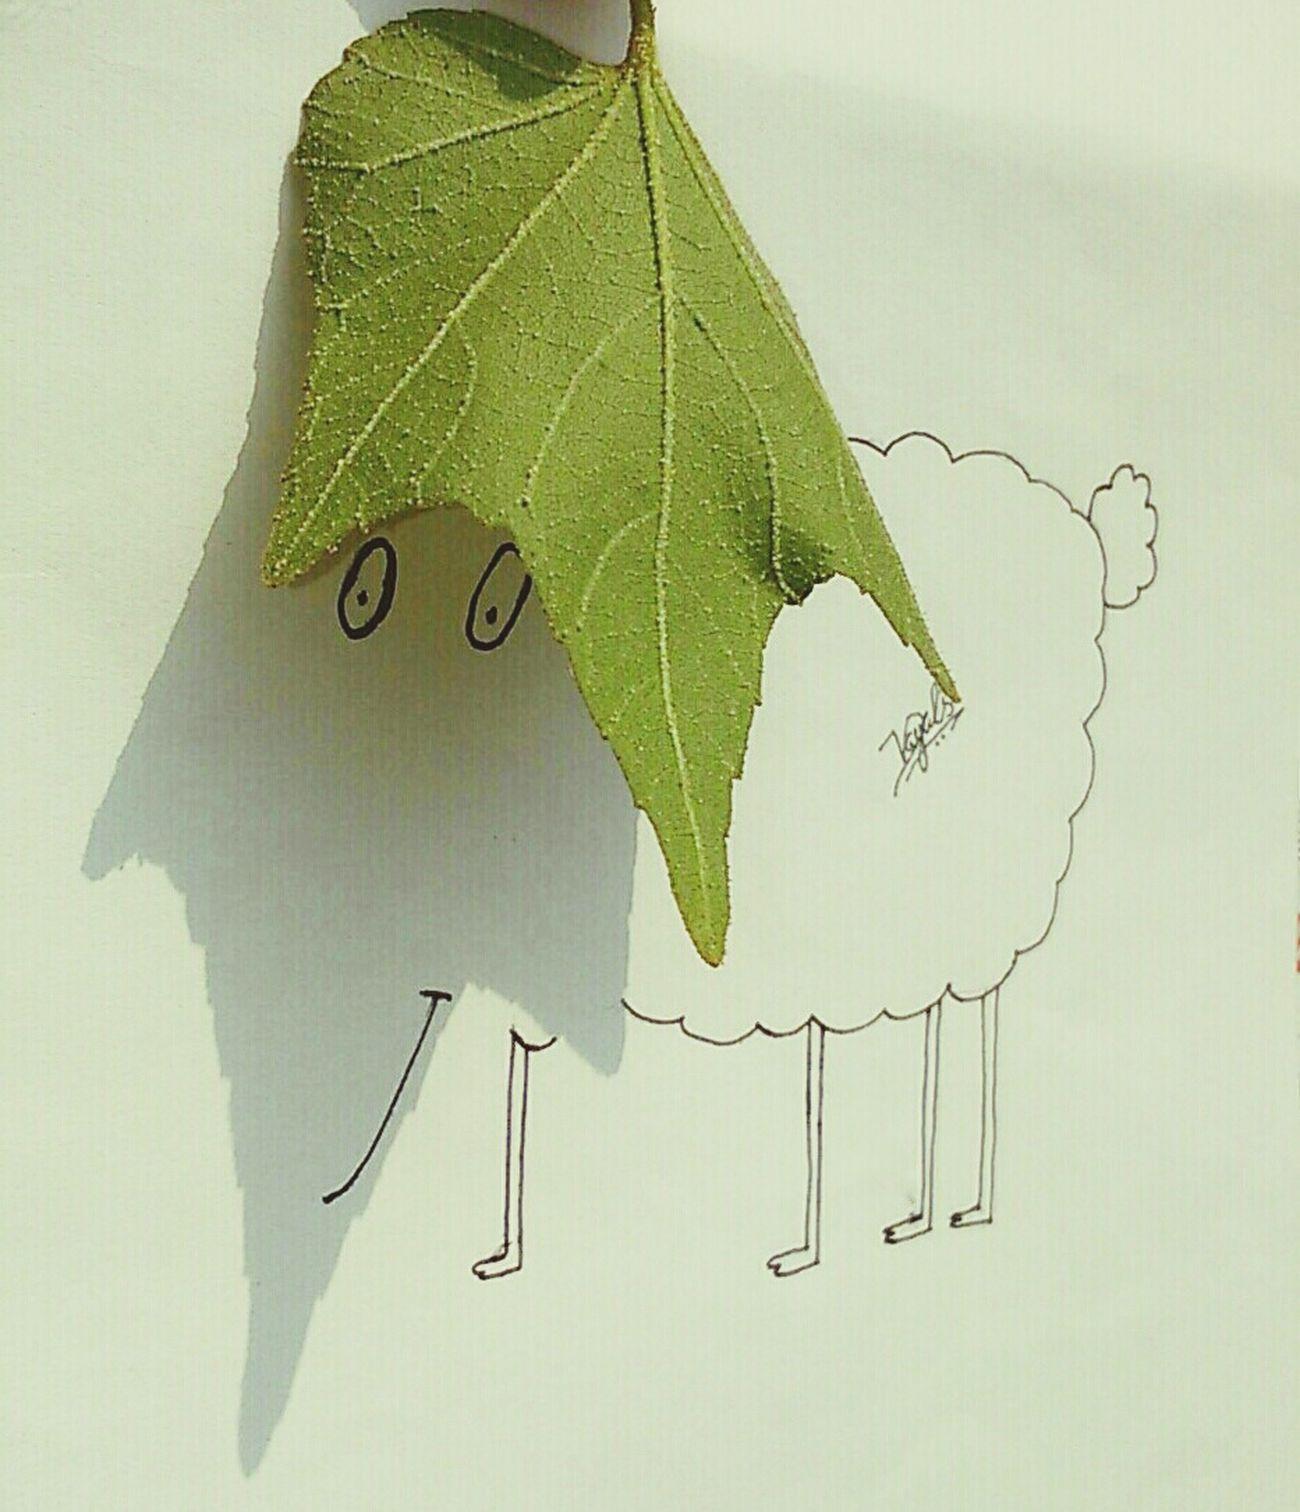 ☀SHADOW ART-1 (SHEEP)🐑 Art Myartwork Myartbook MyArt Artist ArtWork Drawing ArtInMyLife Pencil Art Arts Art Gallery Artoftheday Draw Artgallery Artworks Arte Artsy Creative Shots Creativity Creative Art, Drawing, Creativity Shadow Shadow-art Paper Pencil Drawing